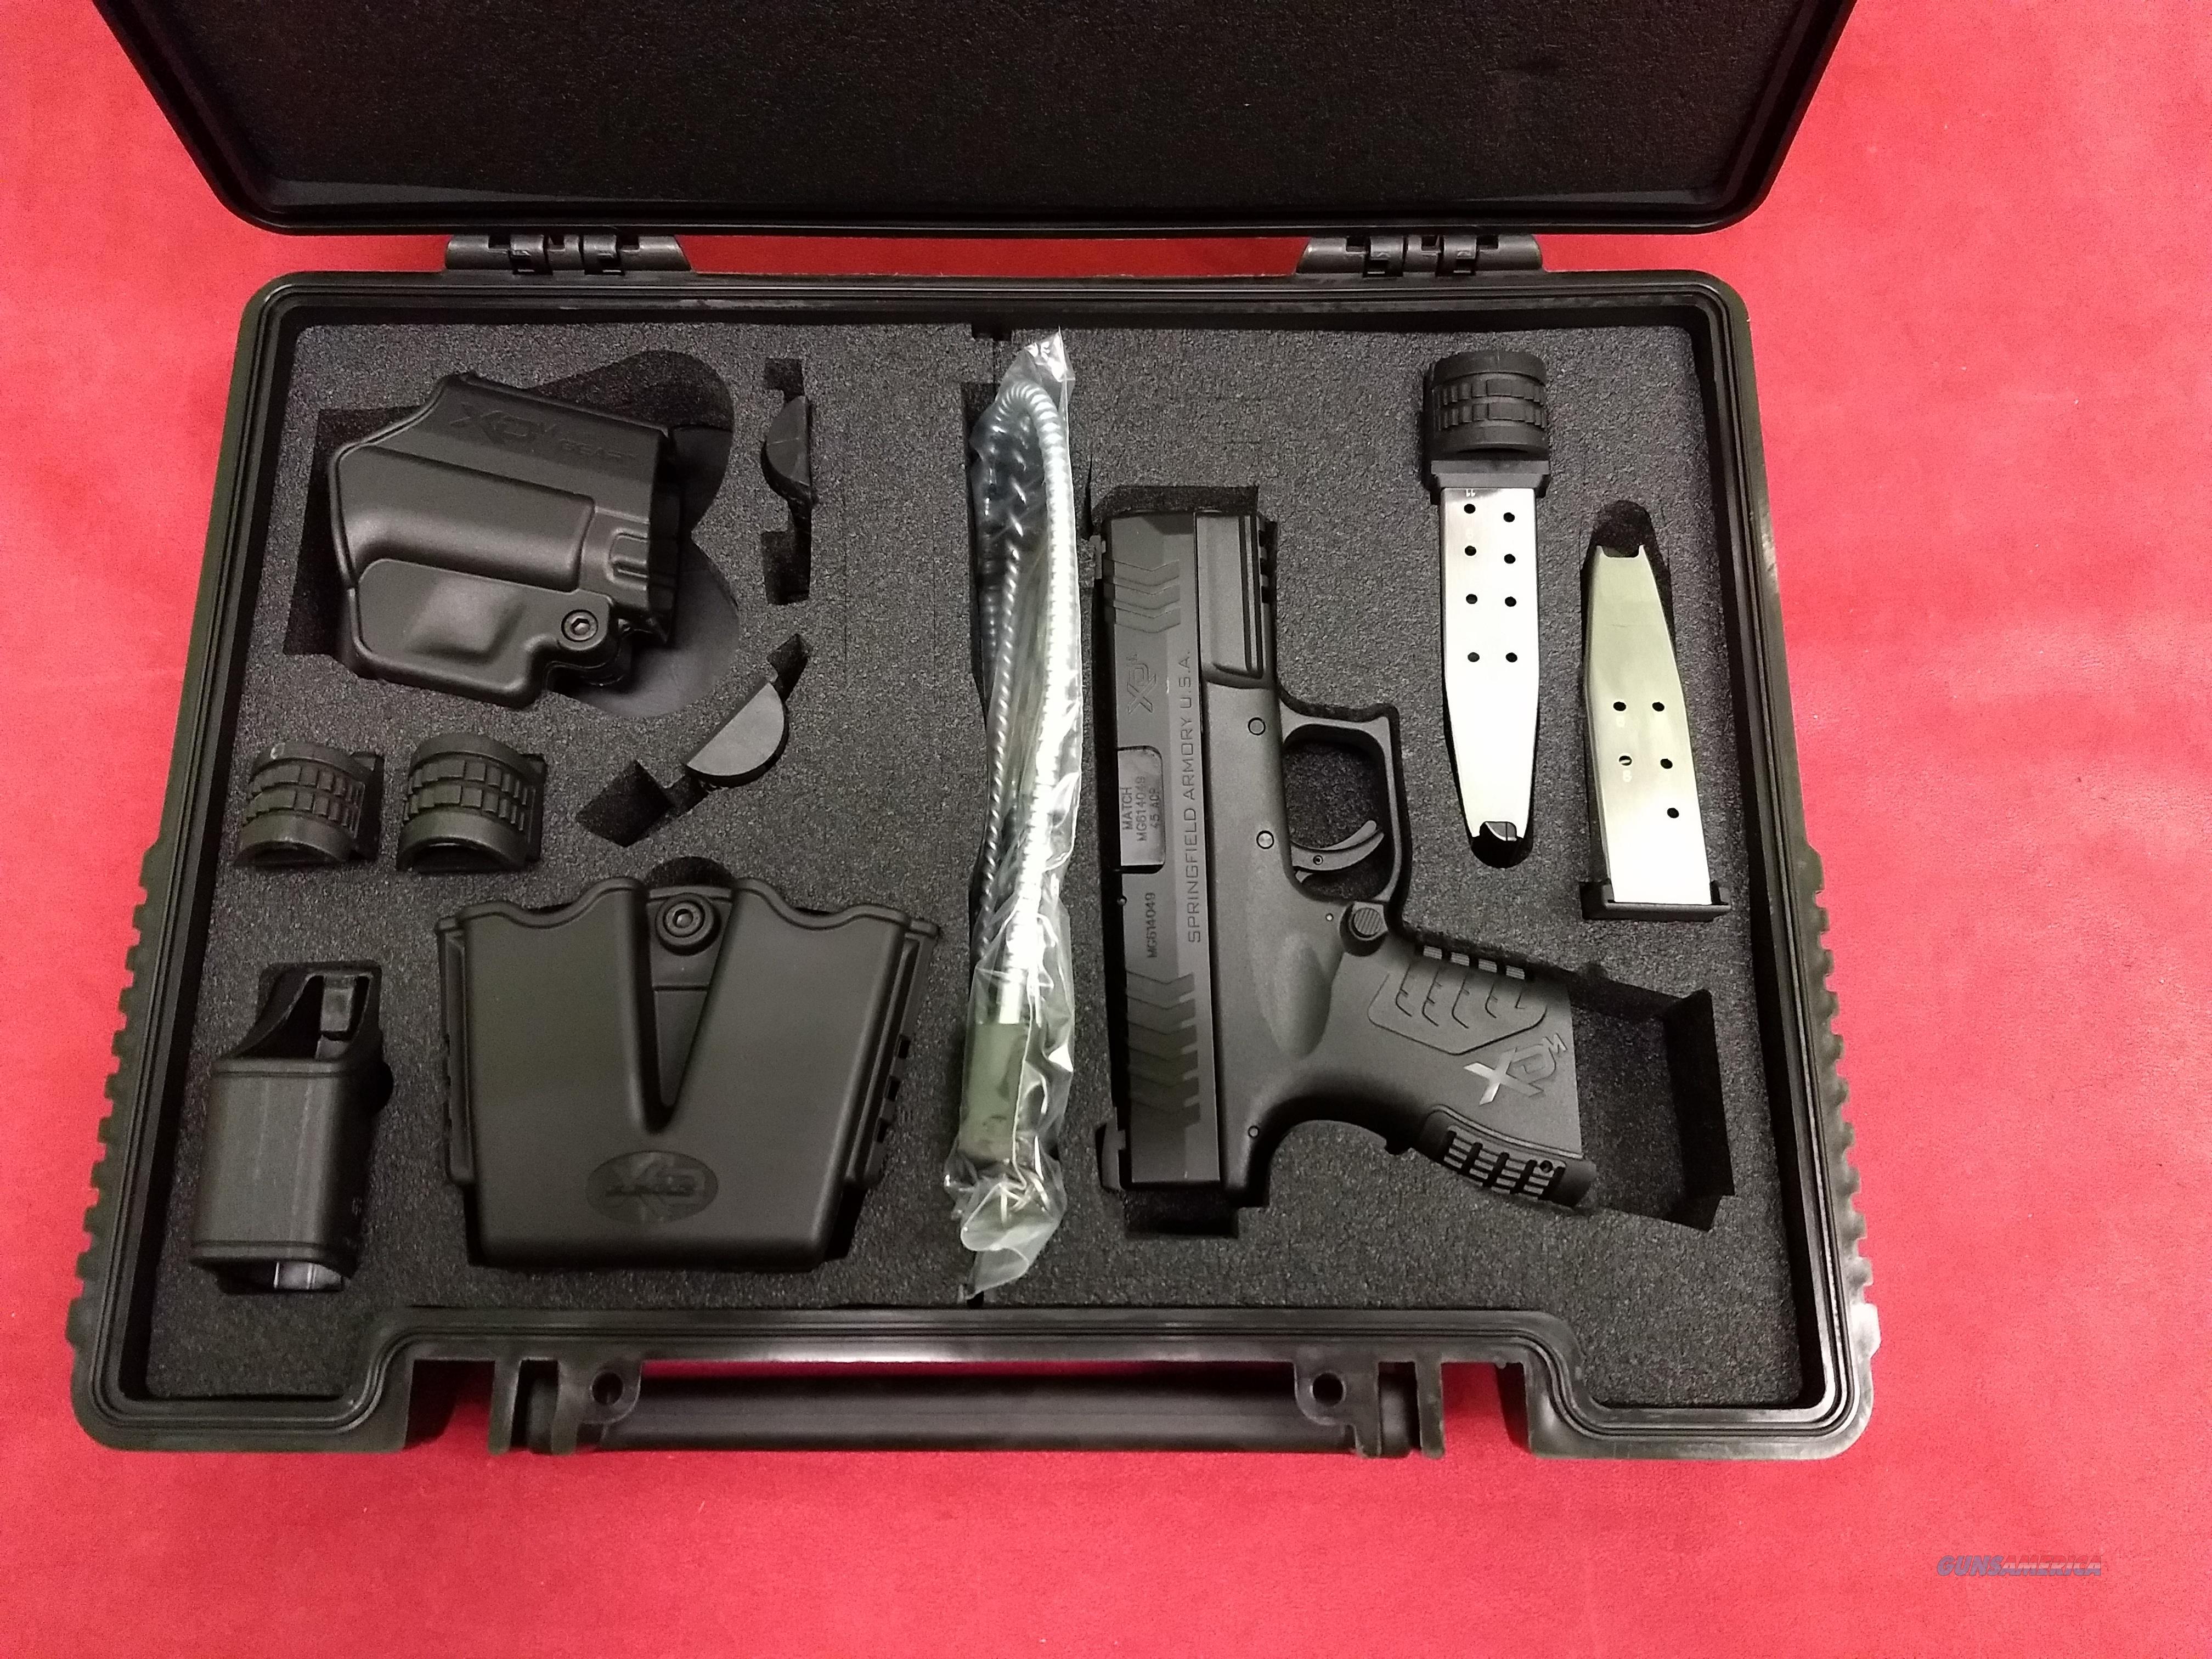 Springfield Armory XDM Compact Pistol, .45 ACP, NIB   Guns > Pistols > Springfield Armory Pistols > XD-M